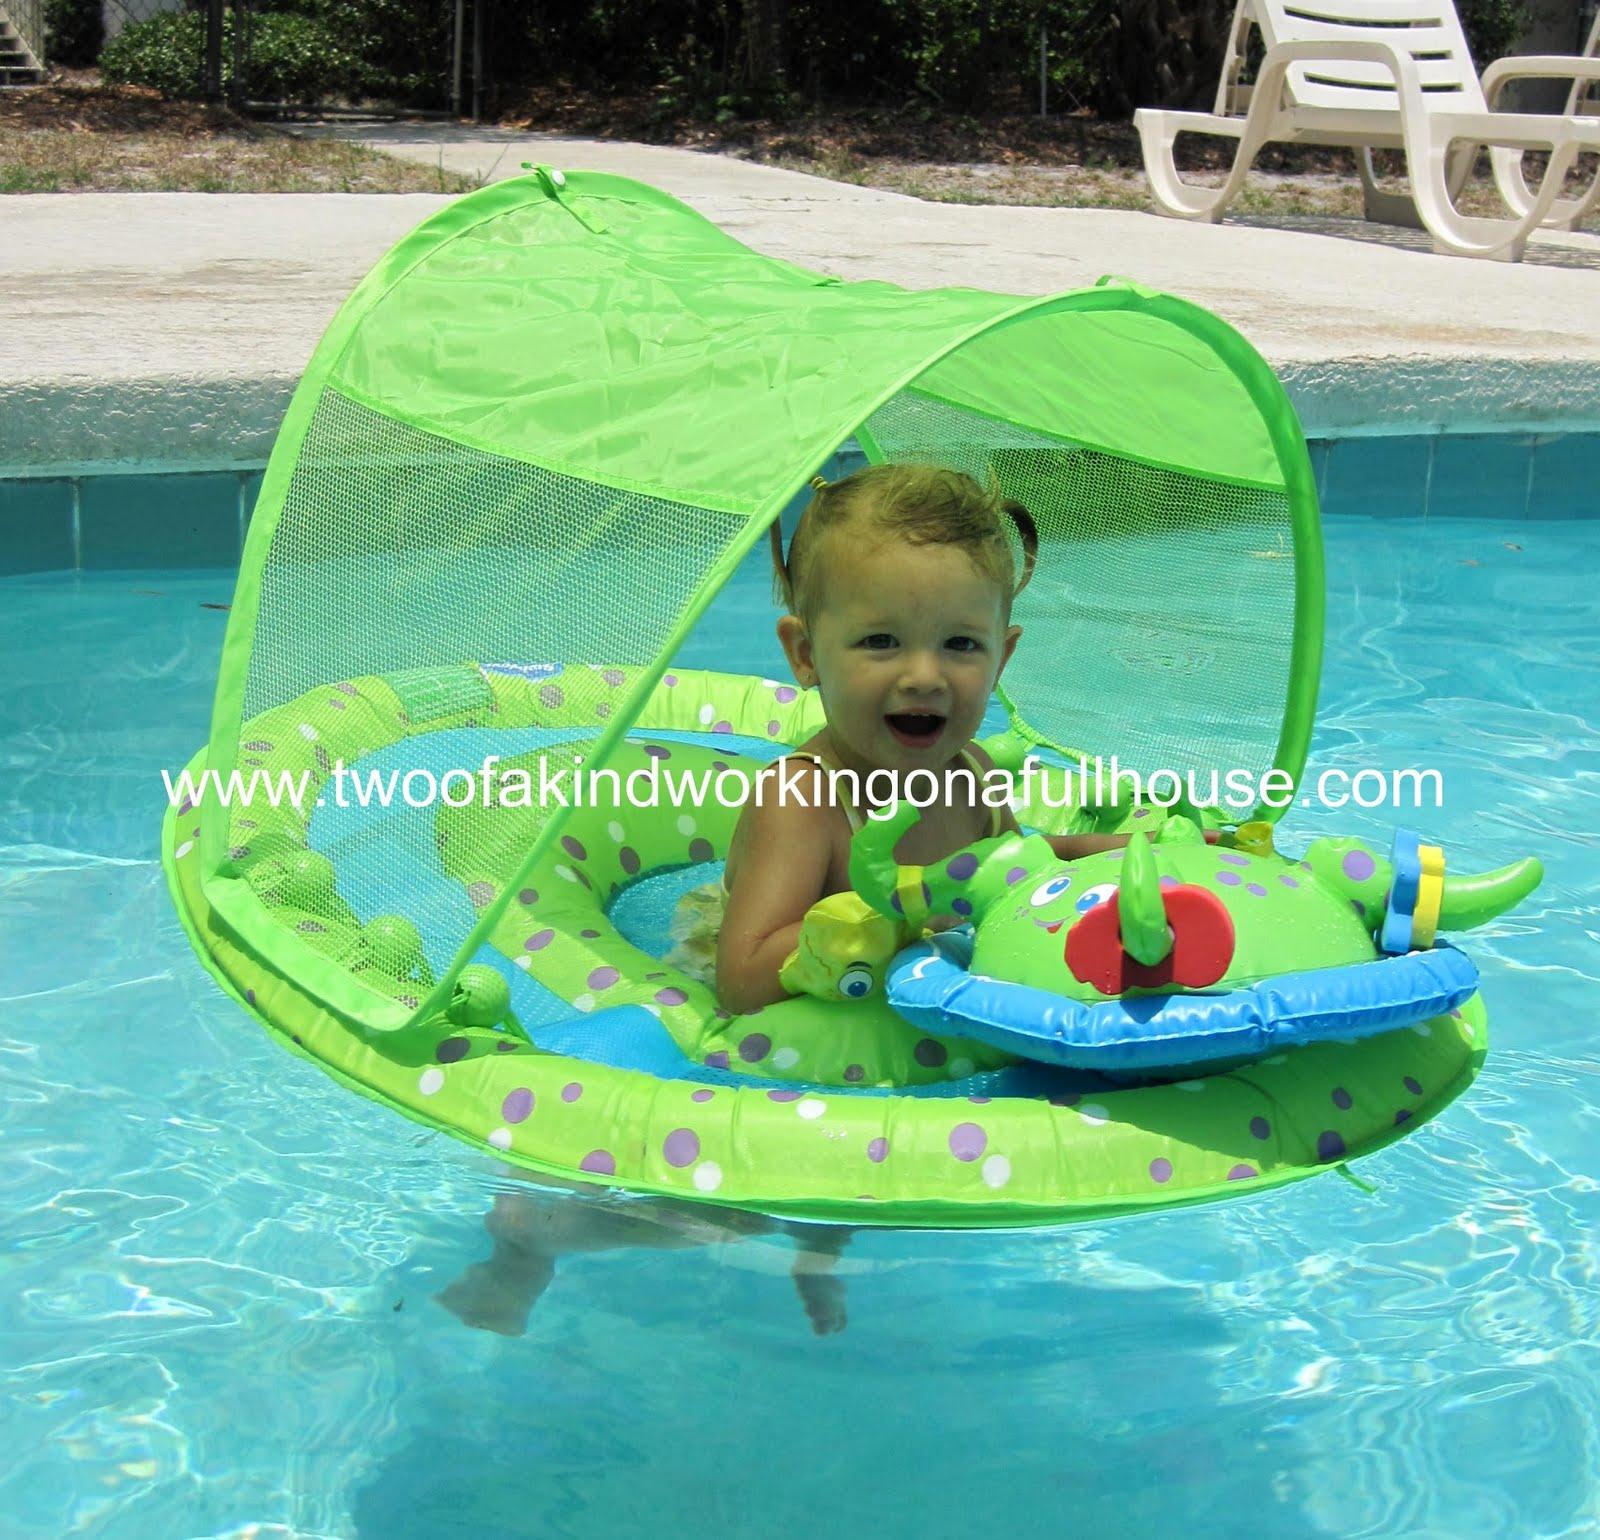 SwimWays Ambassador Teaching Kids To Swim With Pool Floats And